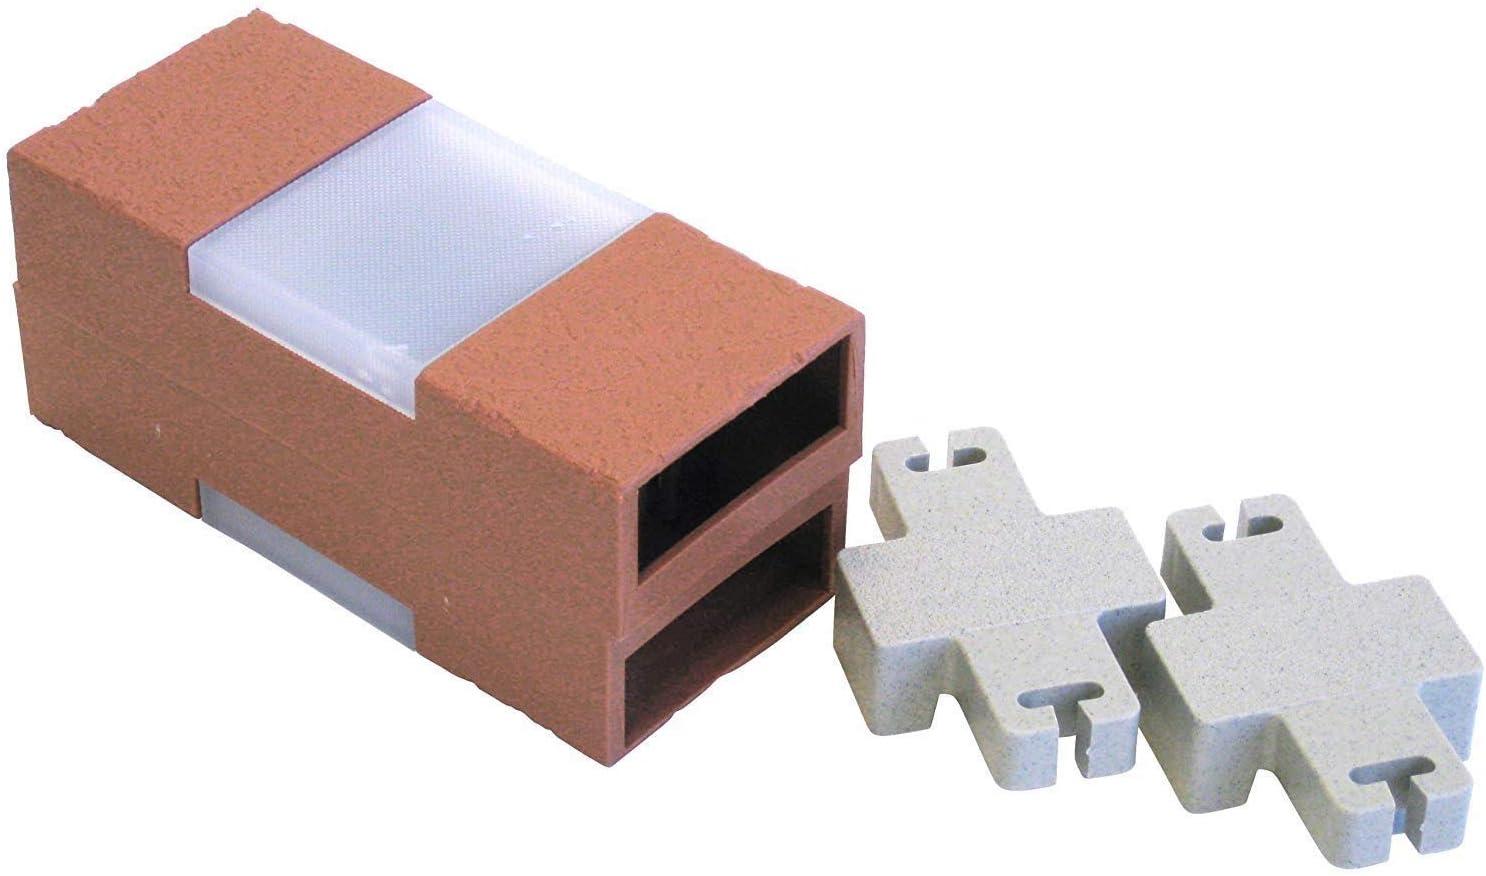 Argee RG873 Brick Edging, Standard, Terra Cotta